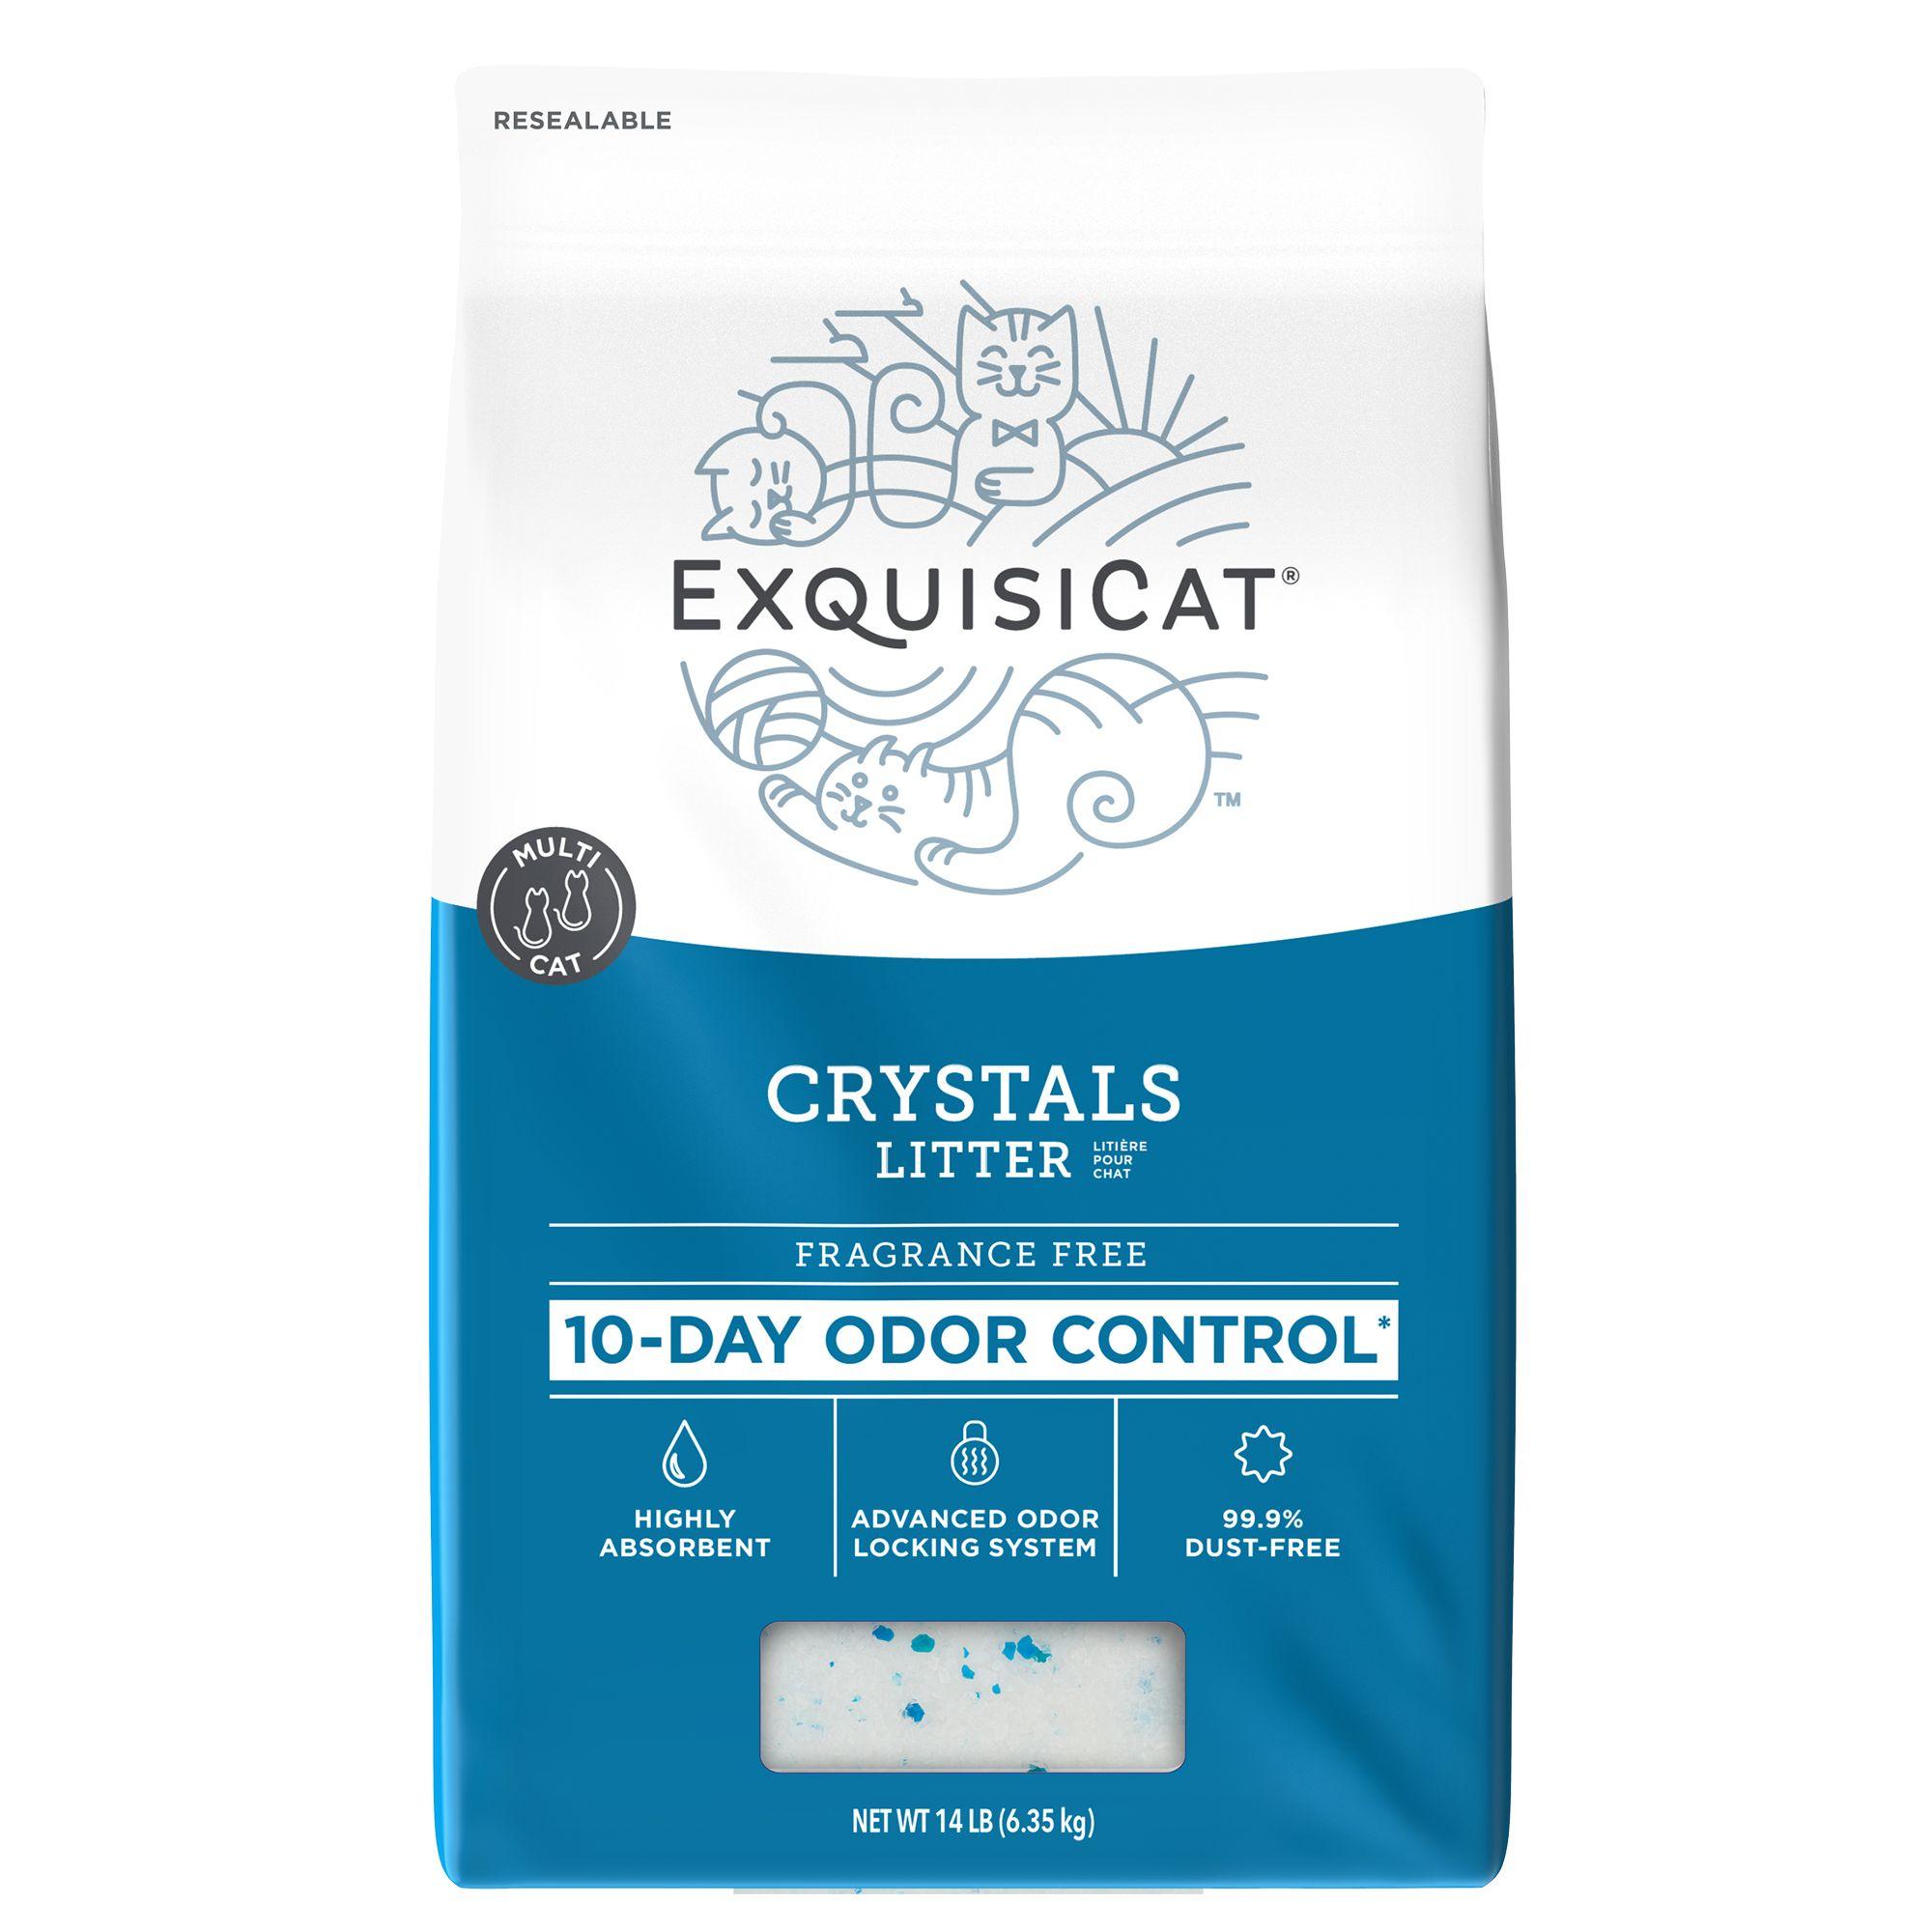 Exquisicat Crystals Low Dust Formula Fragrance Free Cat Litter Size 14 Lb